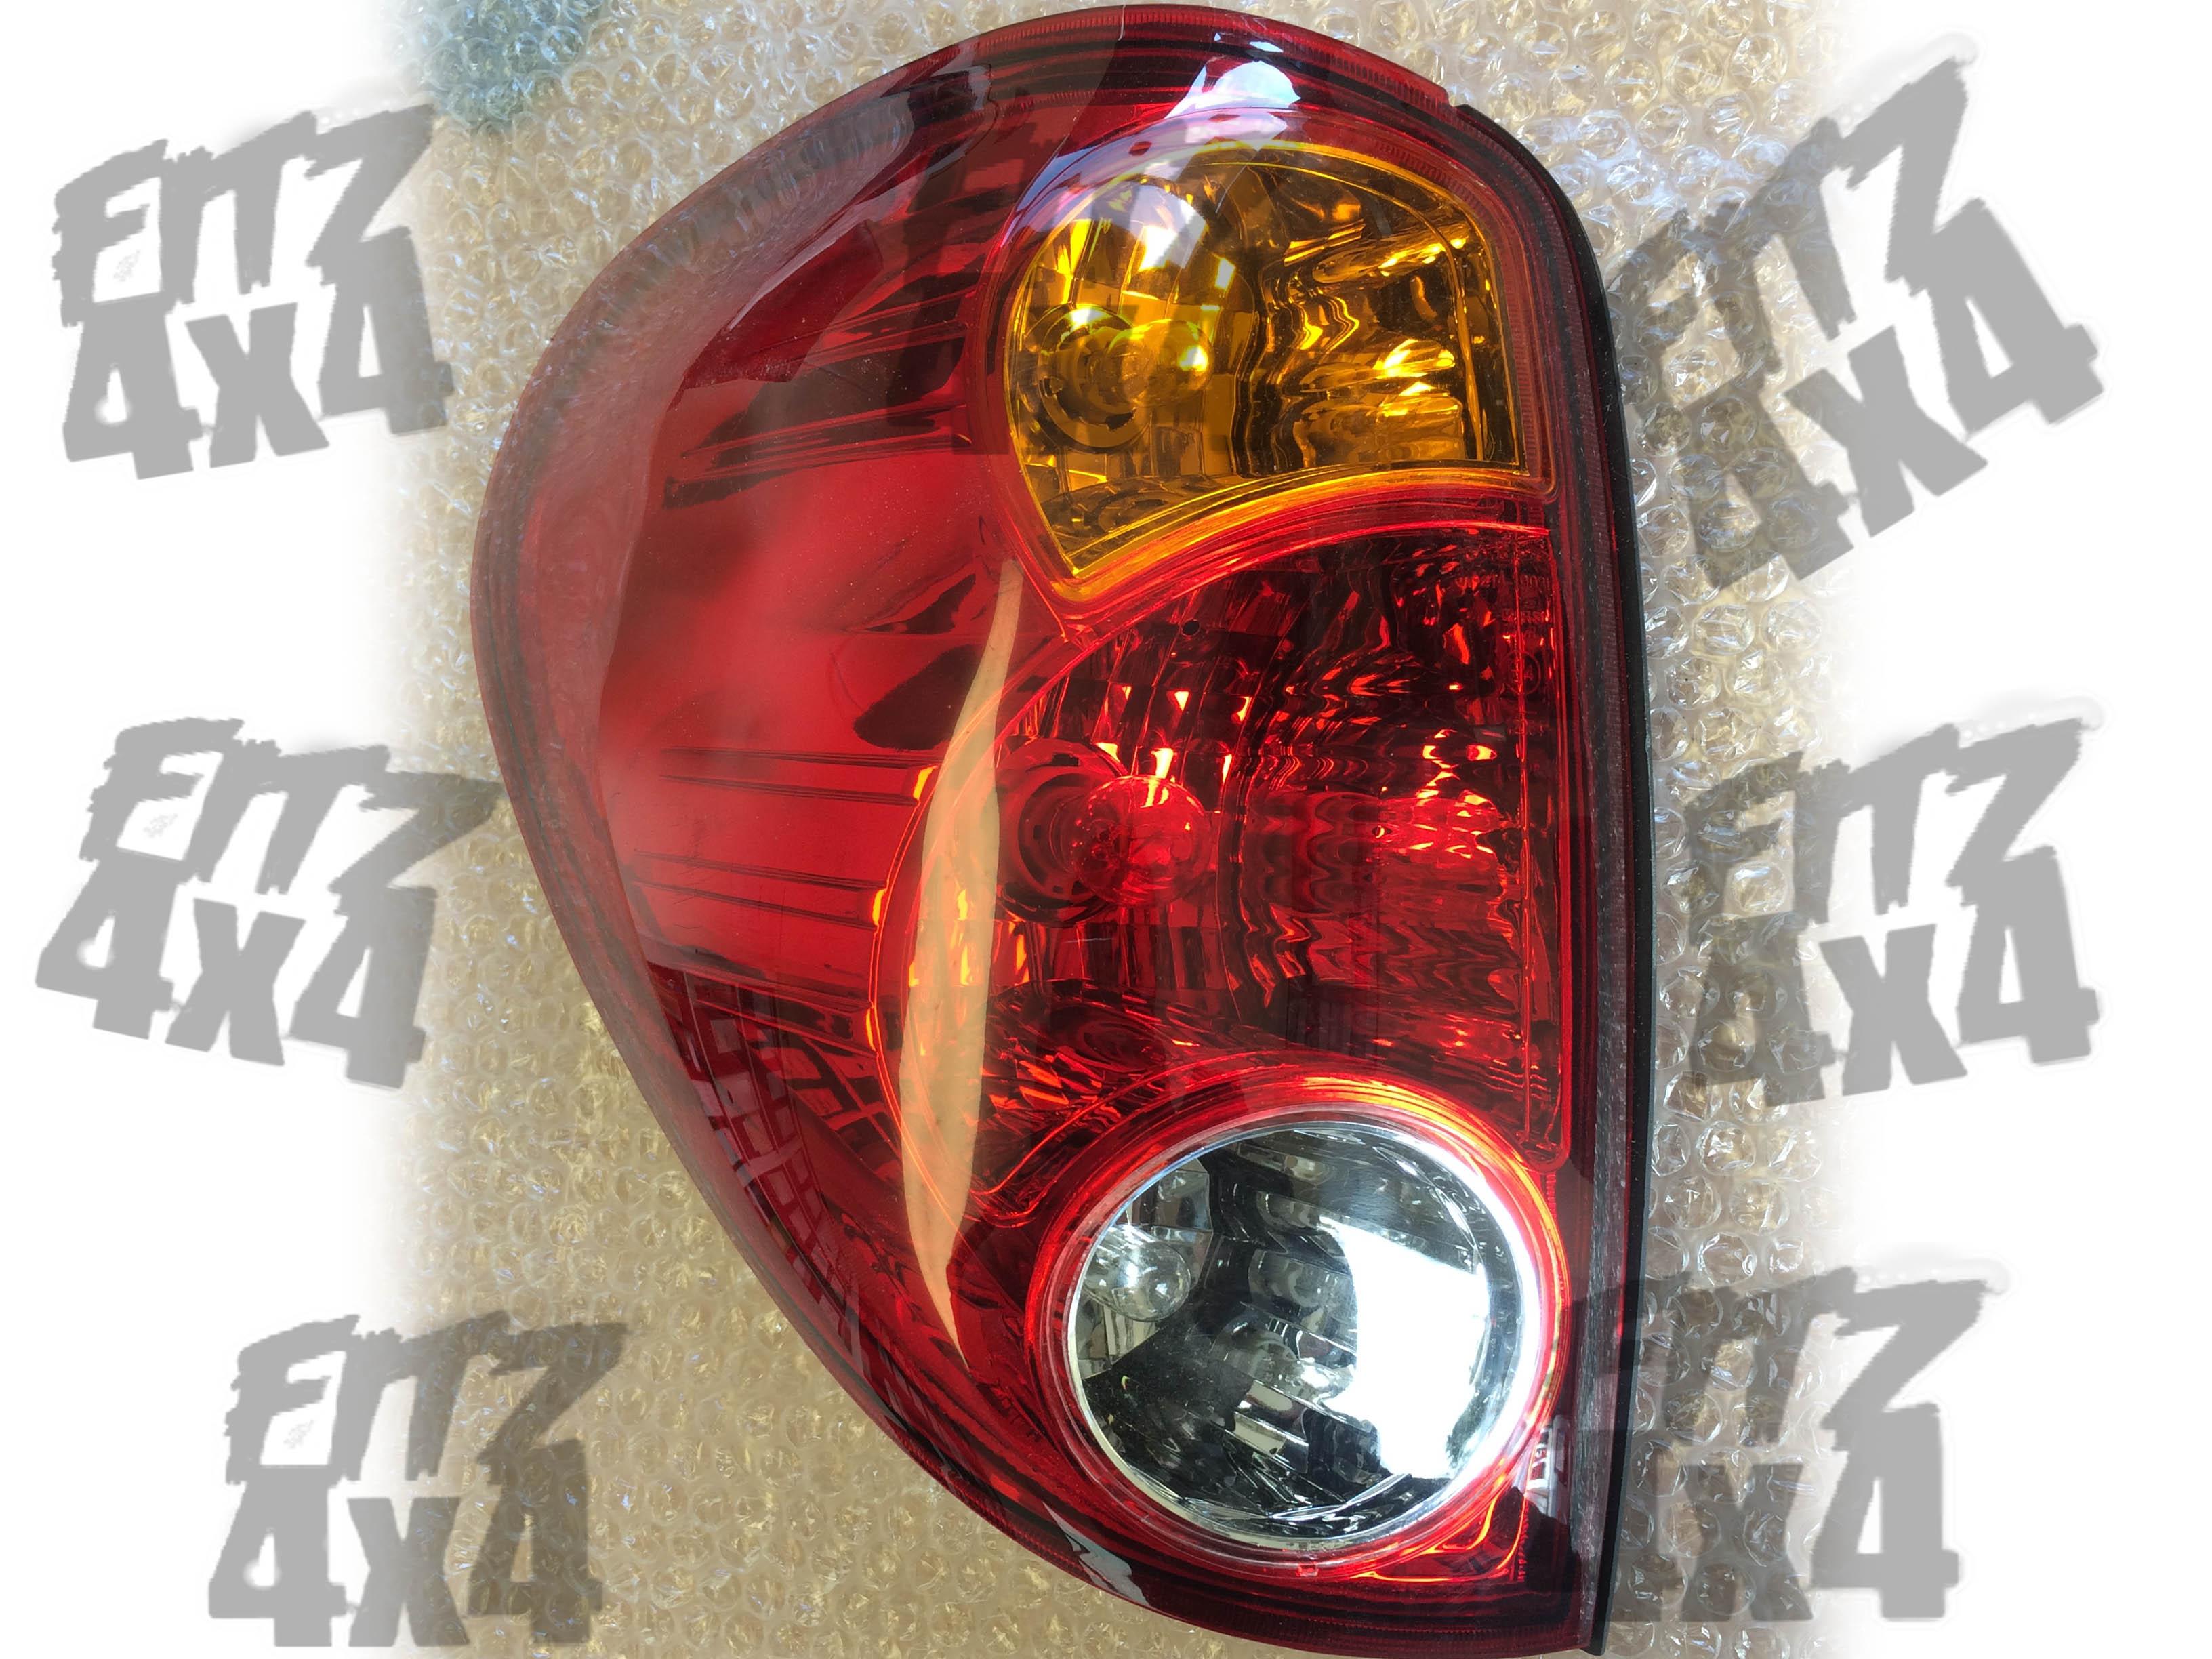 2006-2014 L200 rear left tail light